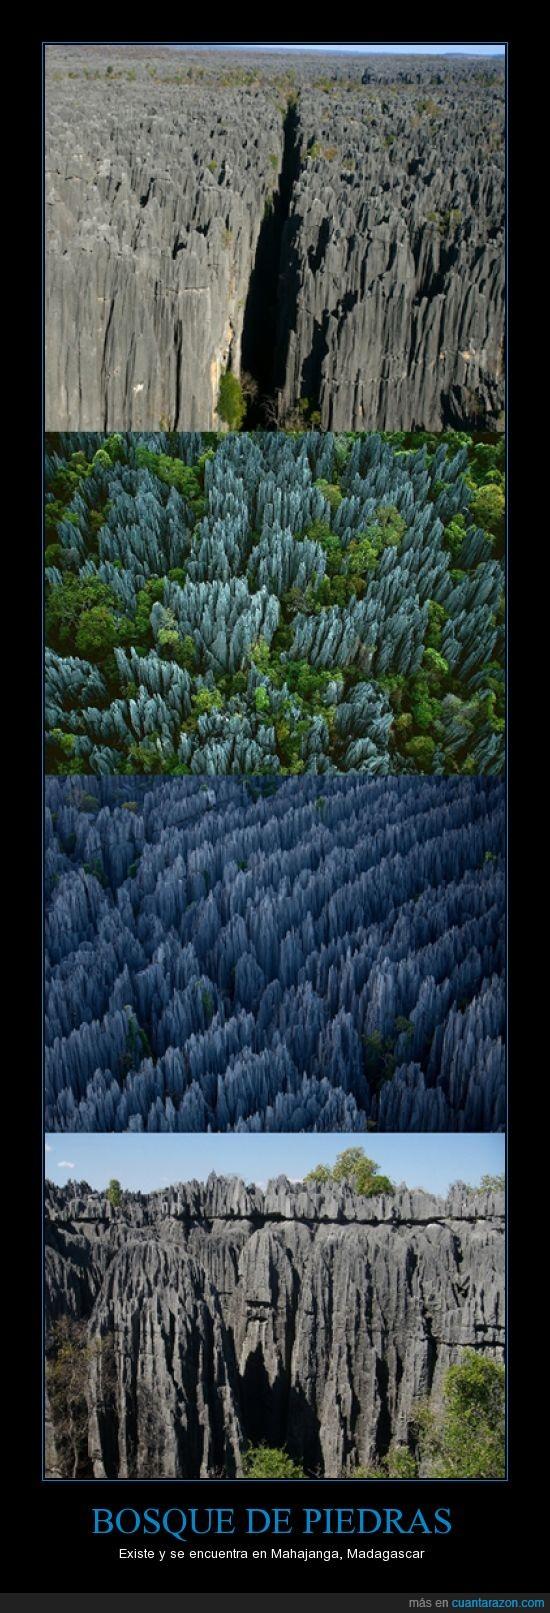 Bosque,Caliza,Erosión,Madagascar,Piedras